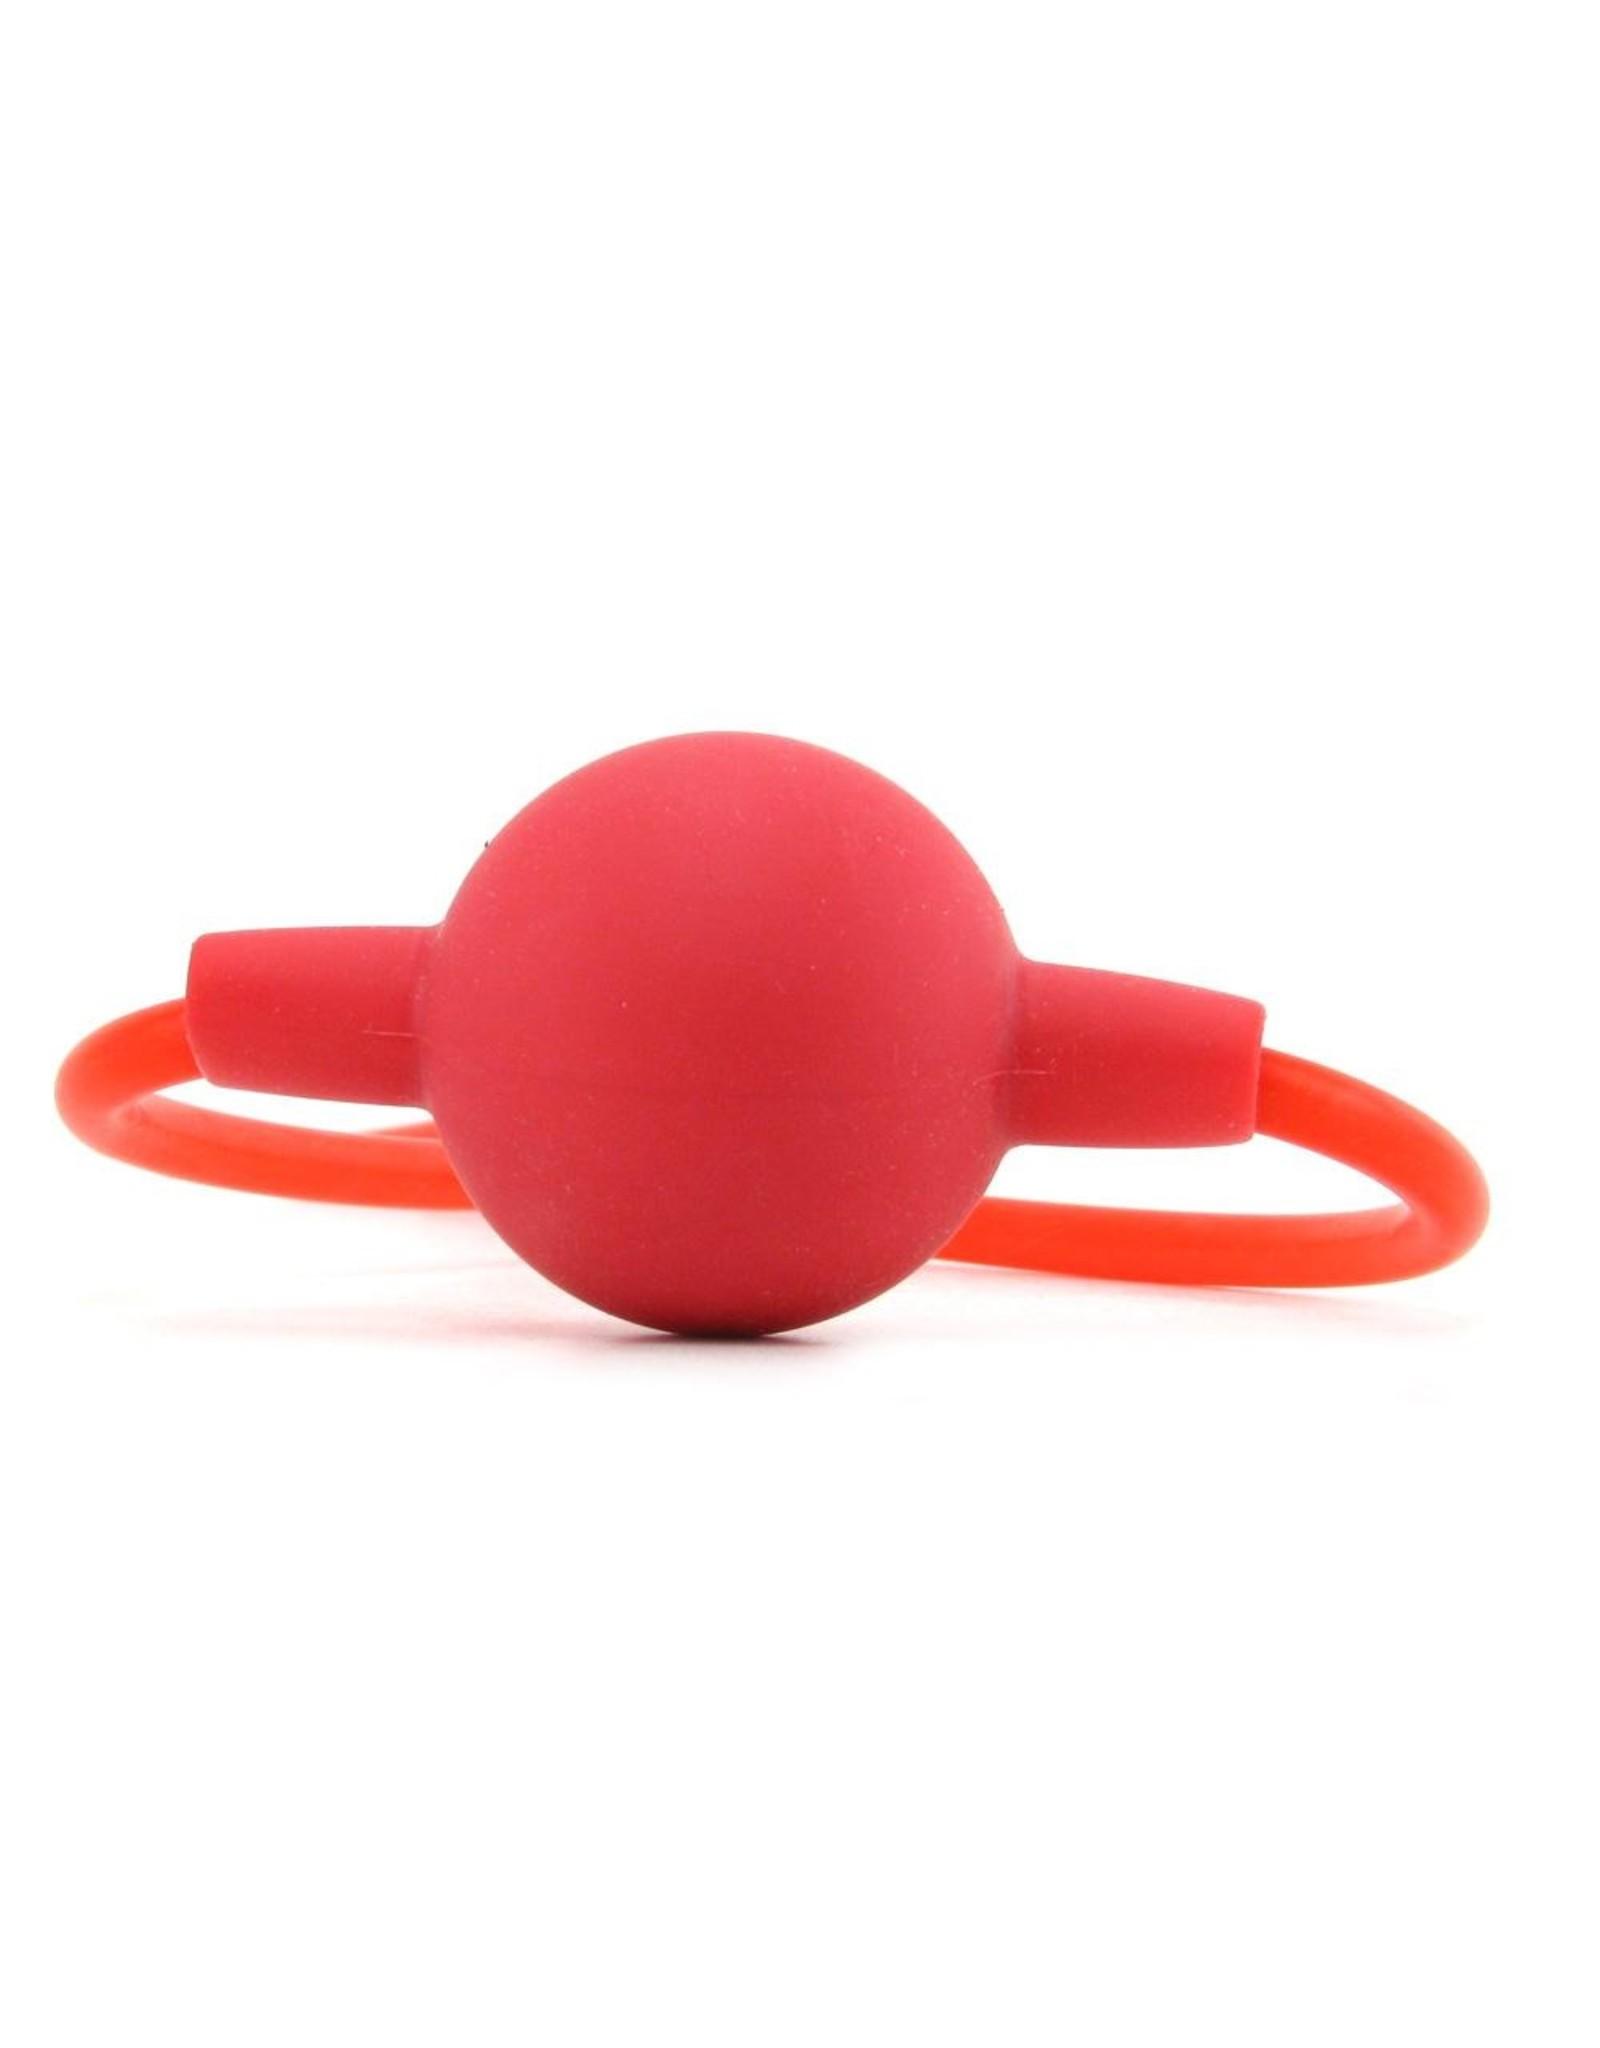 CALEXOTICS CALEXOTICS - SILICONE BALL GAG - RED